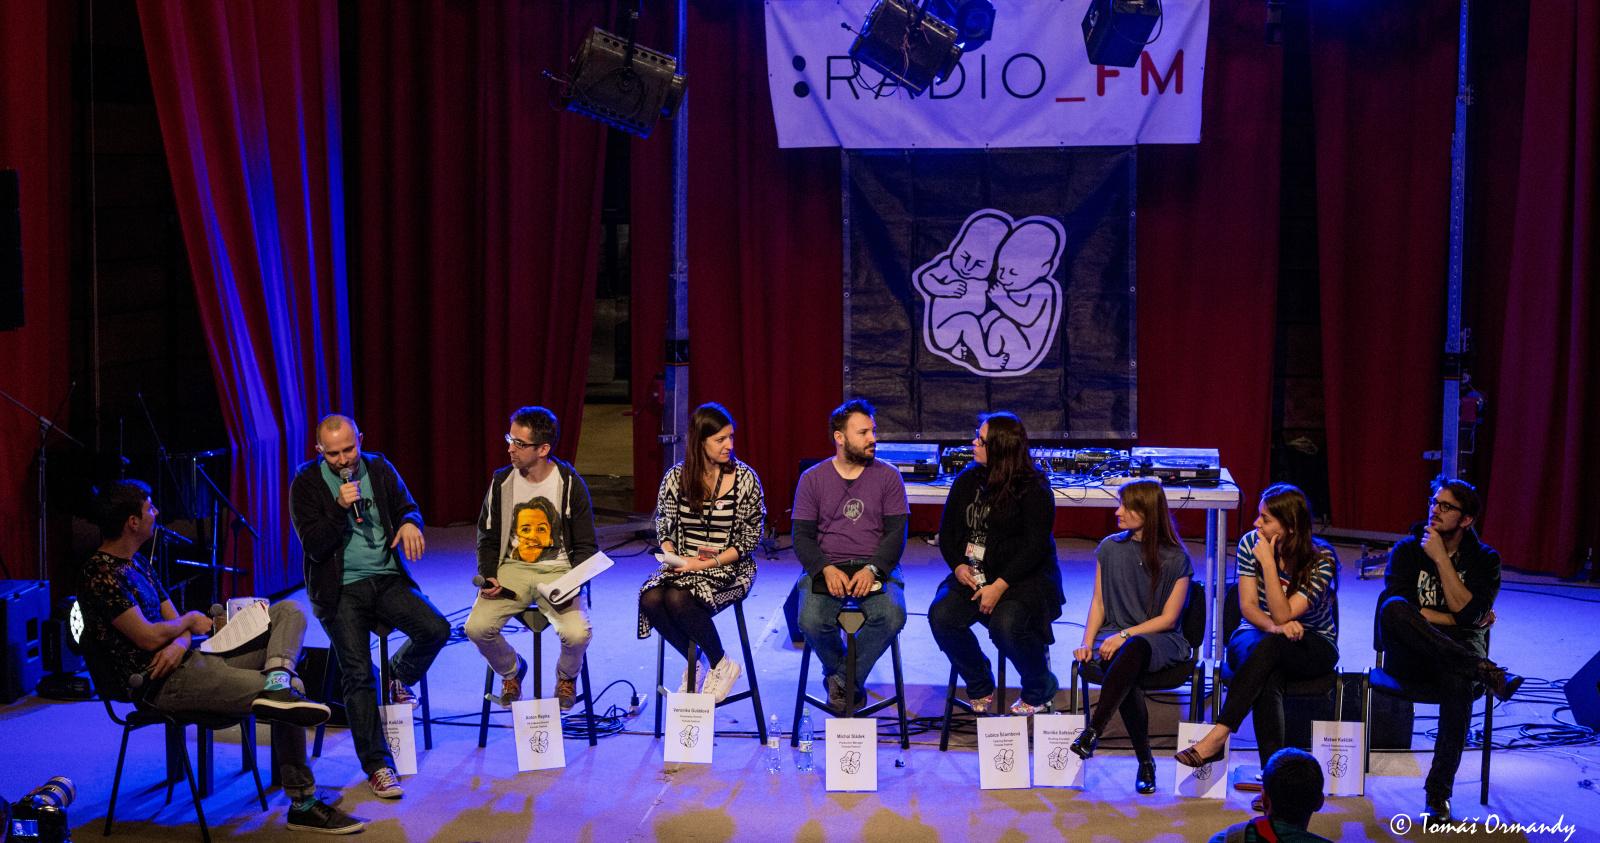 Pohoda Deň_FM 2016 / Foto: Tomáš Ormandy